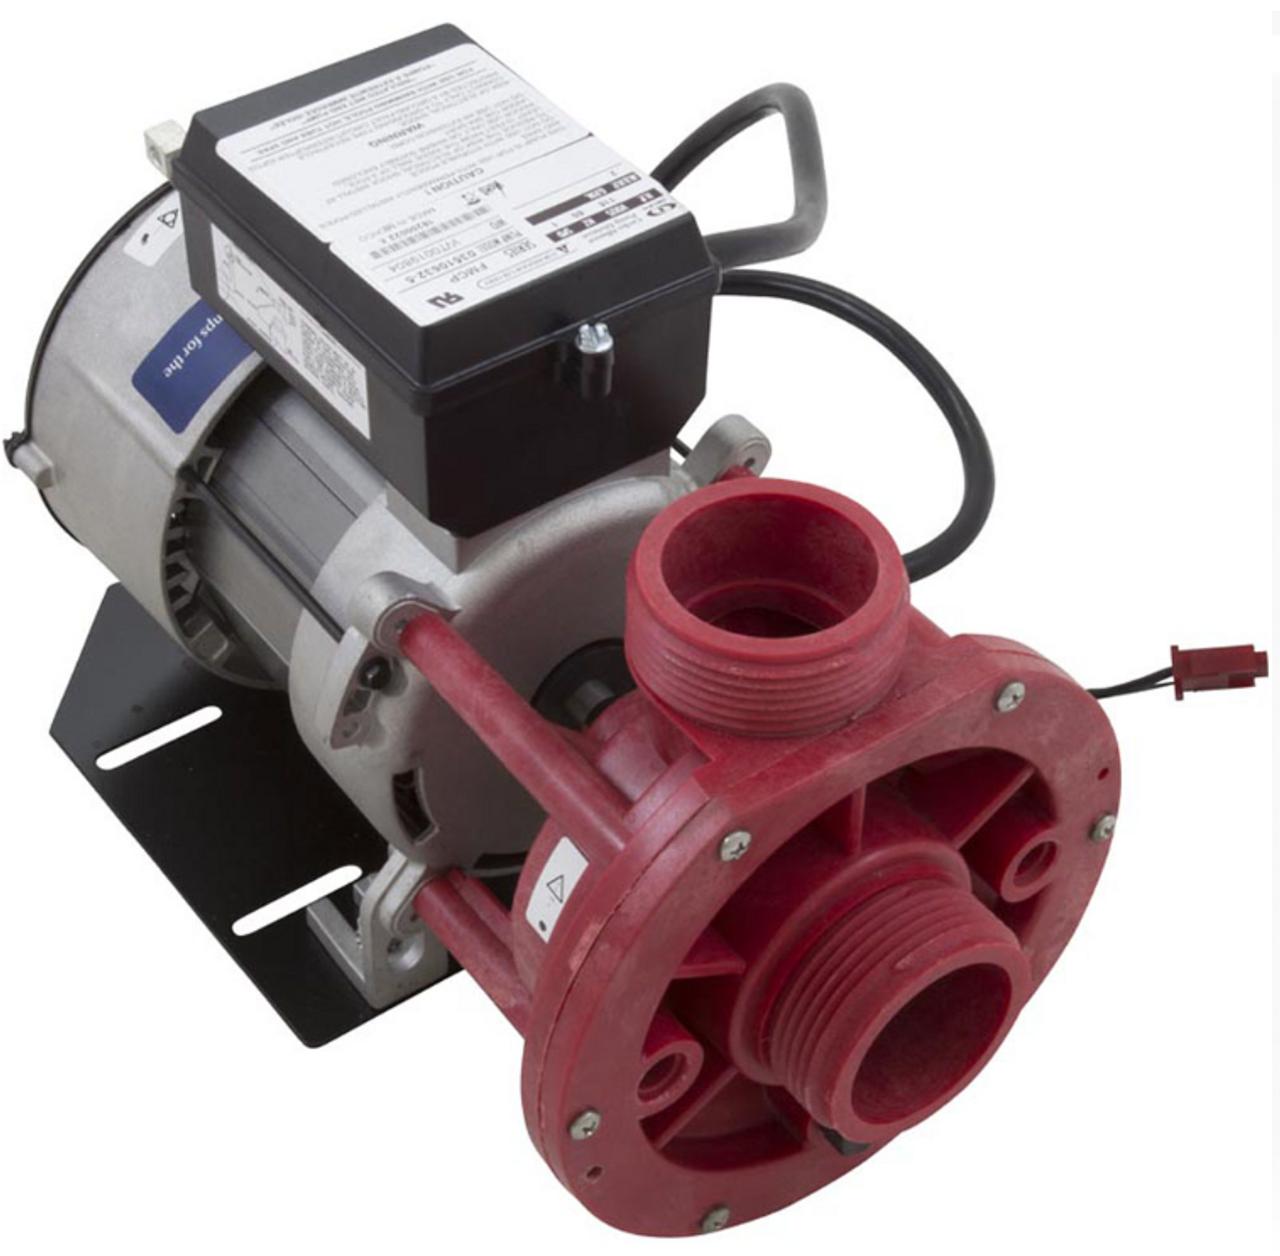 "Gecko AquaFlo FloMaster Pool Spa Pump Threaded Union Adapter 1.5/"" x 2/"" 50100130"